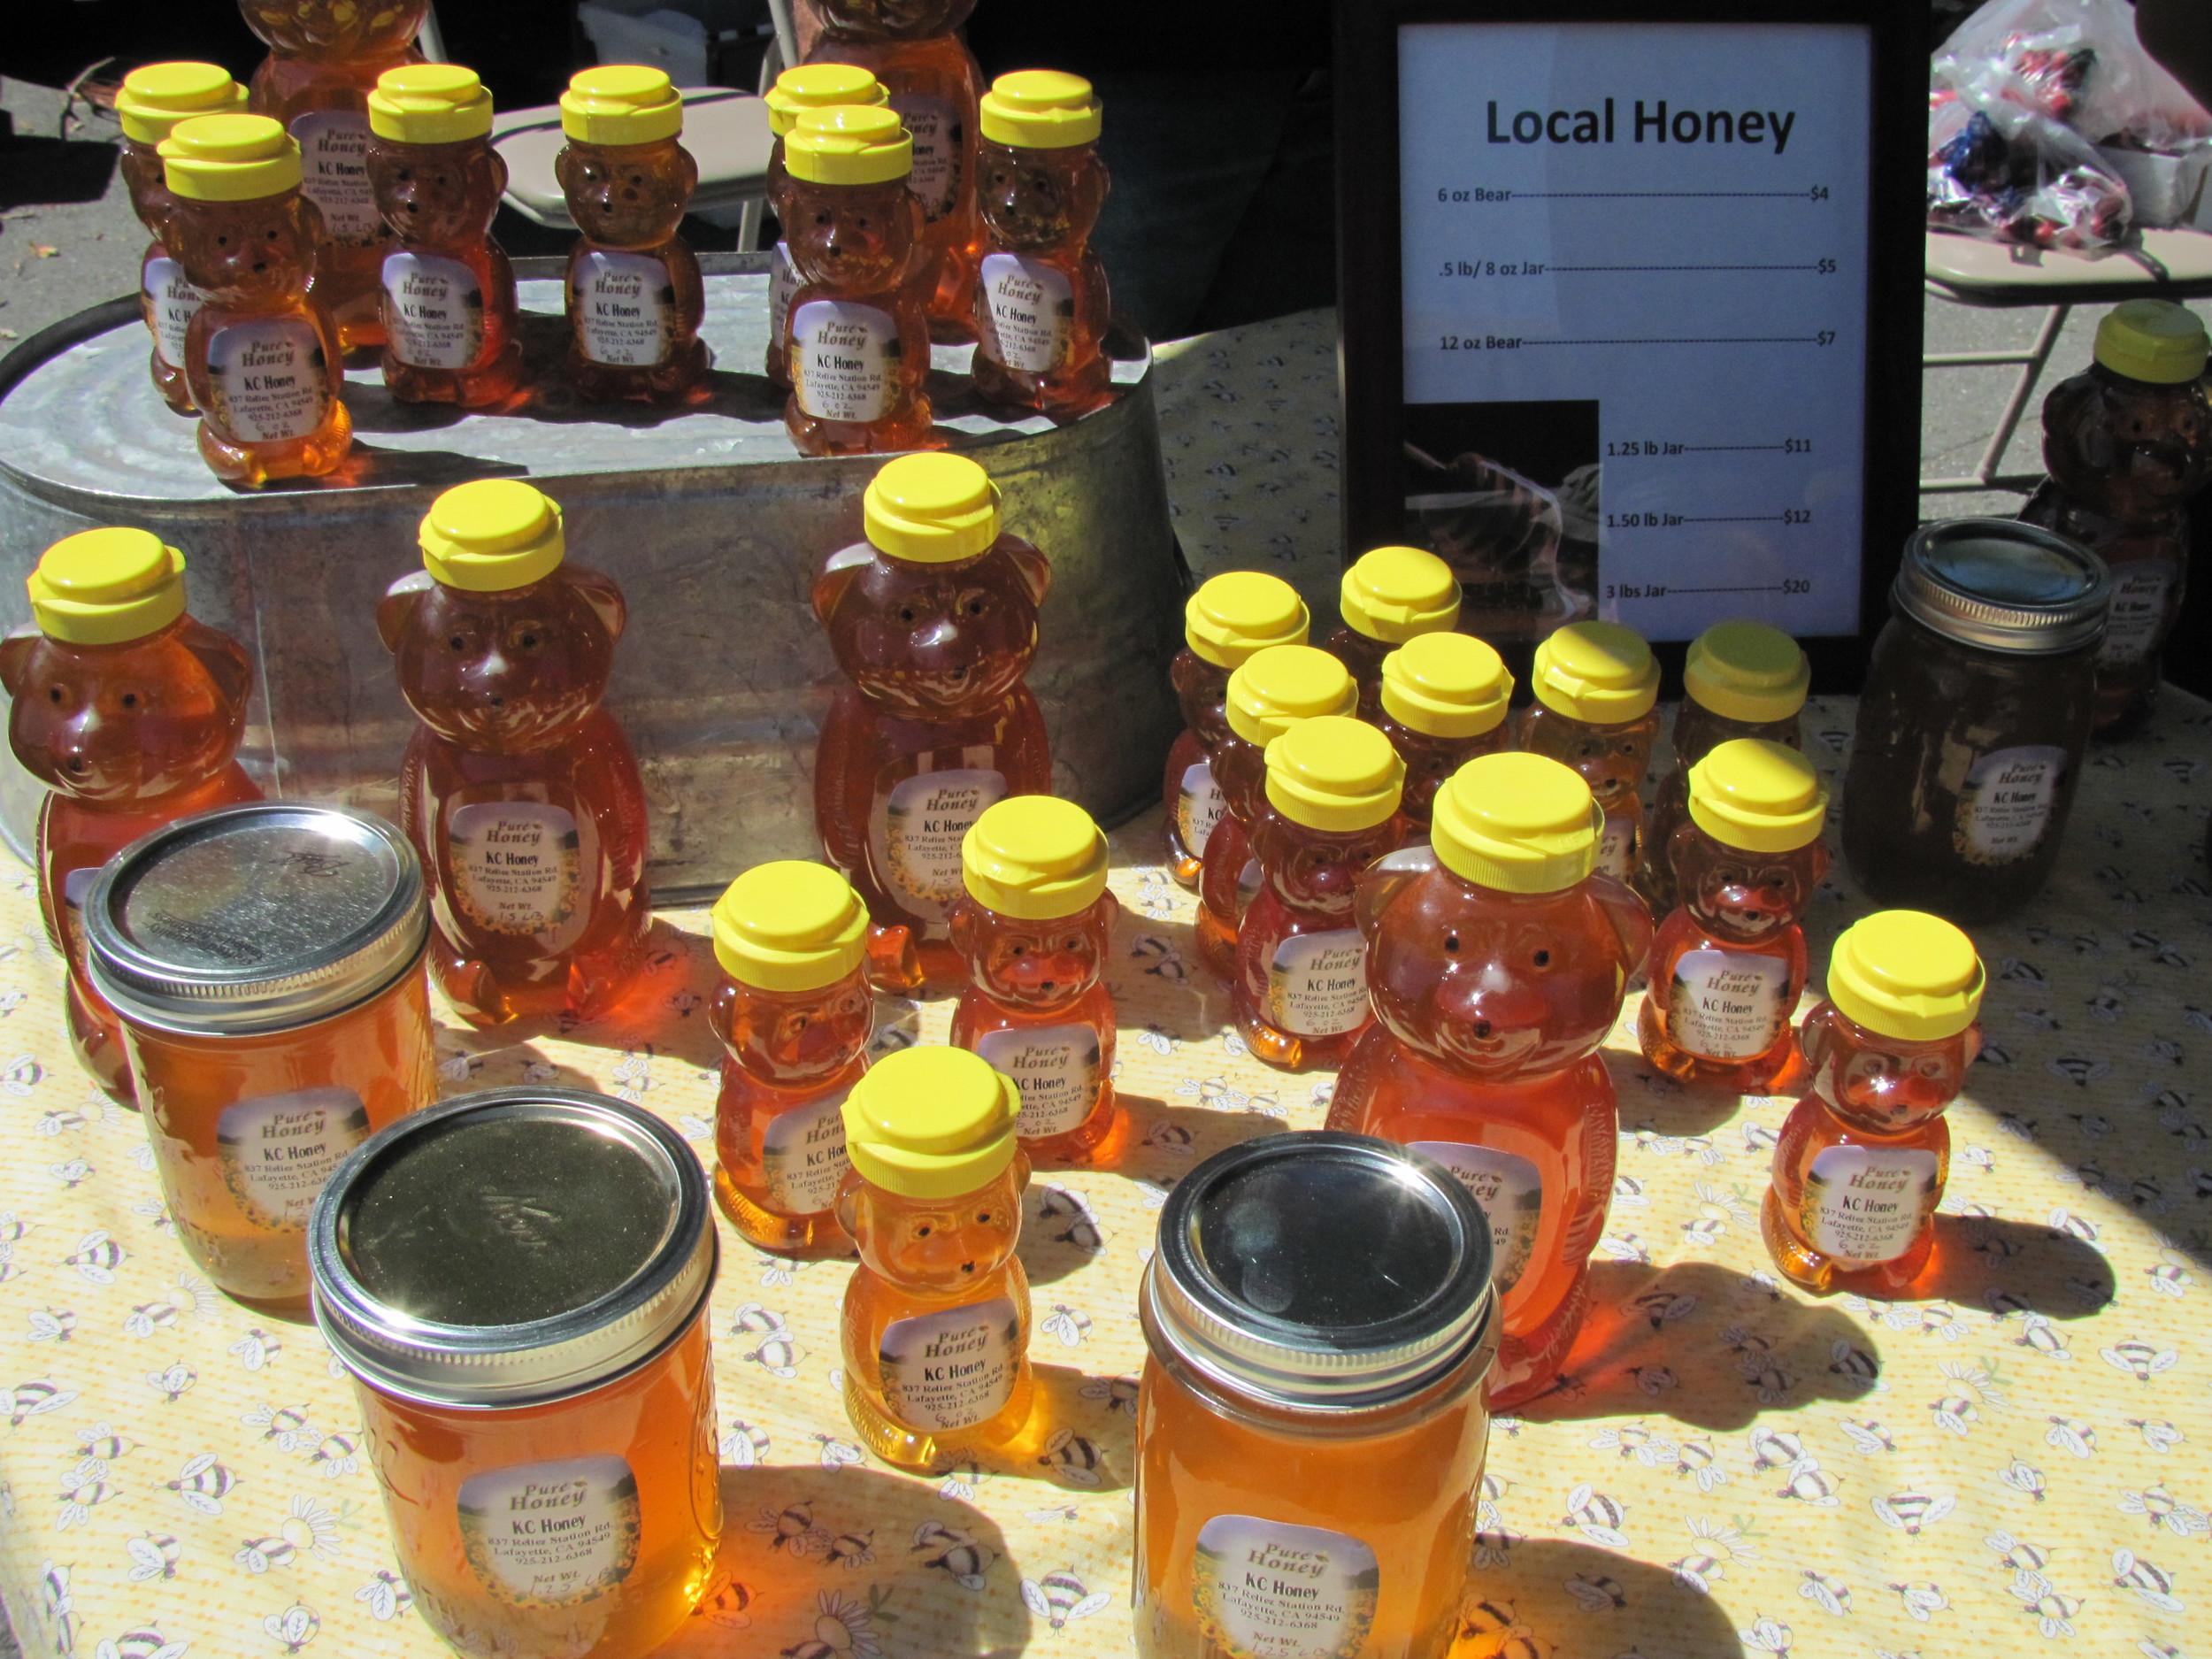 Rossmoor Farmers' Market local honey